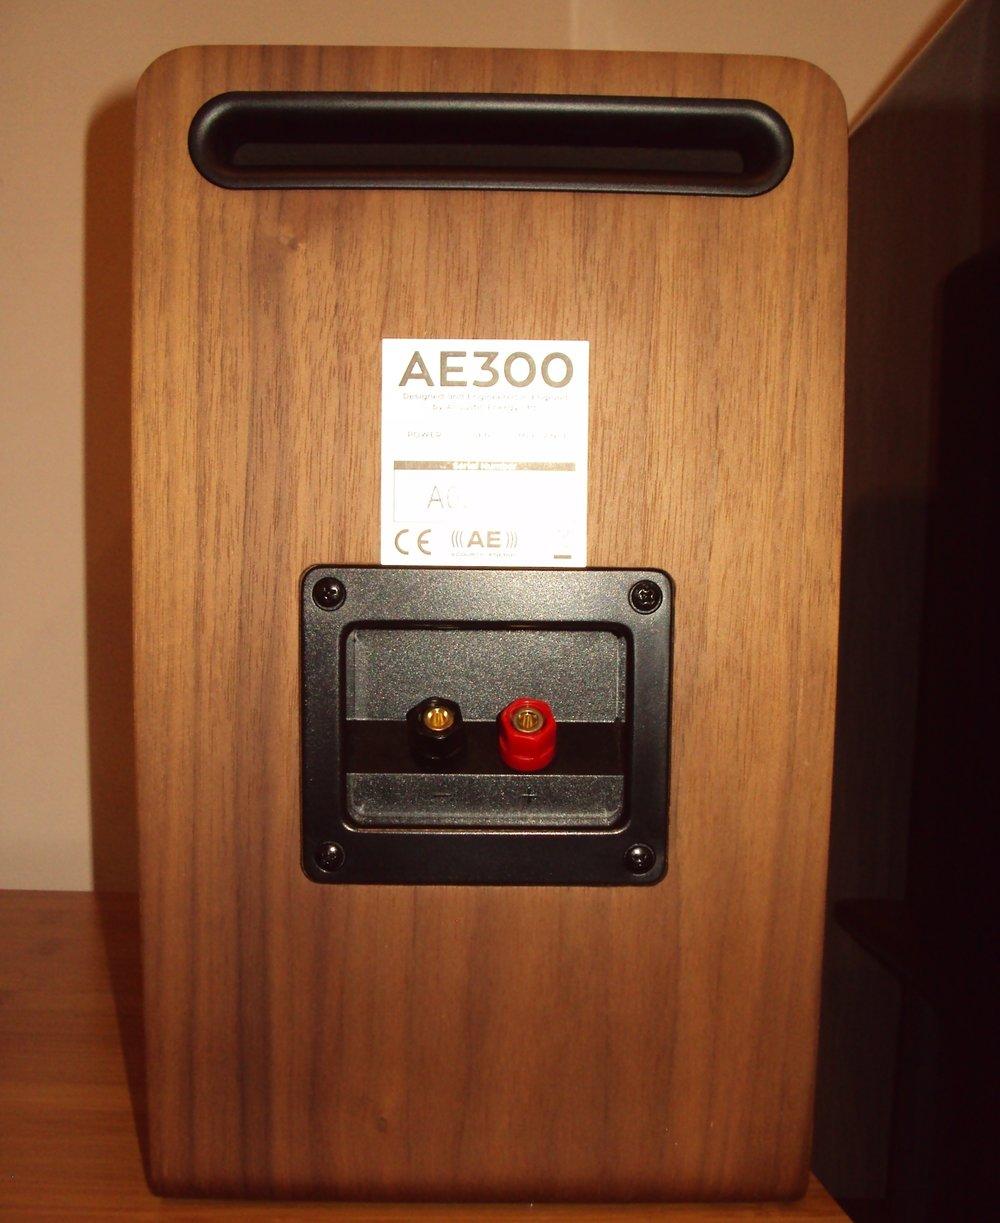 AE300 Rear.JPG